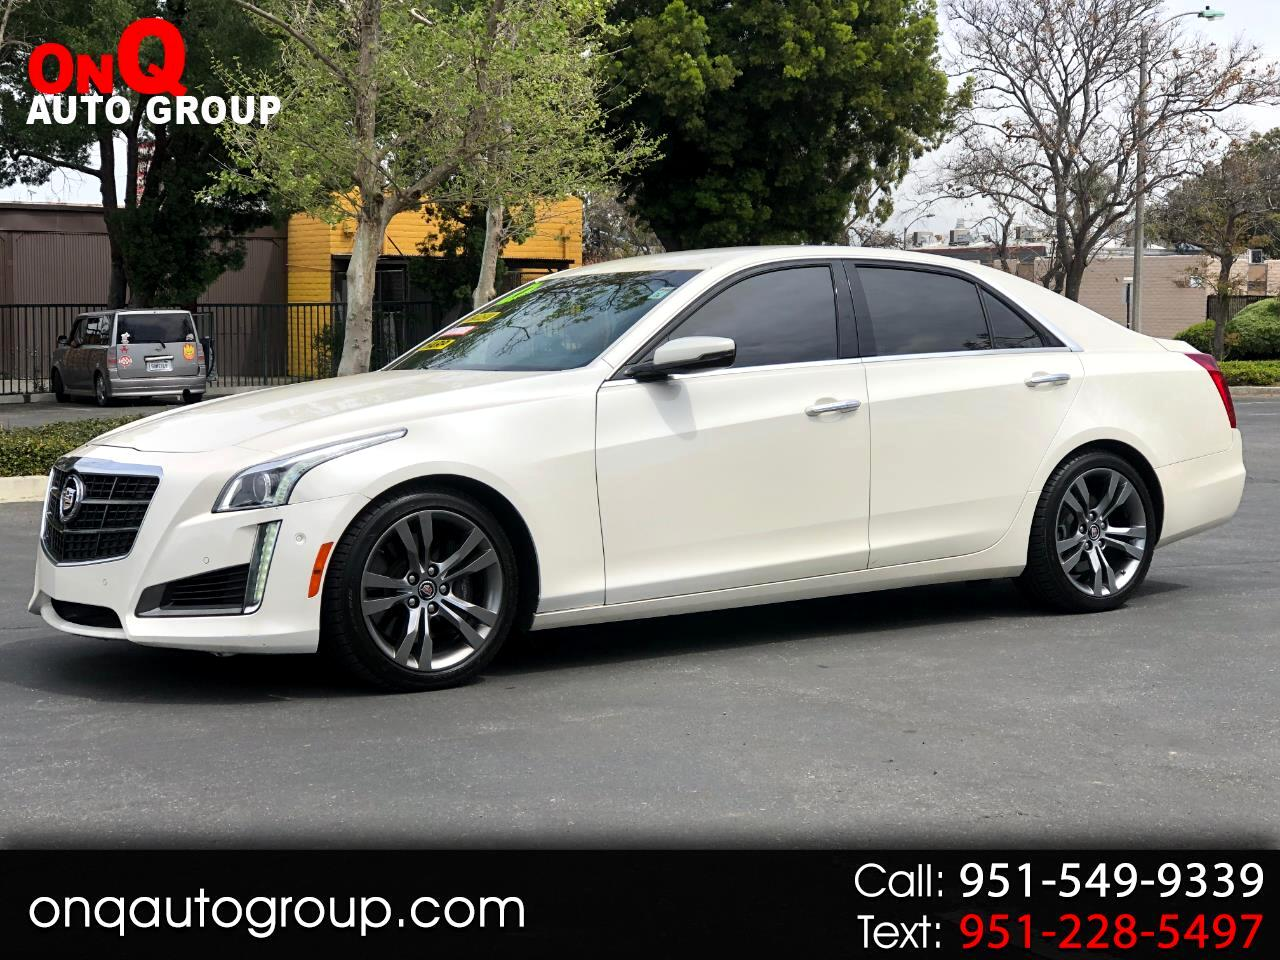 2014 Cadillac CTS Sedan 4dr Sdn 3.6L Twin Turbo Vsport RWD